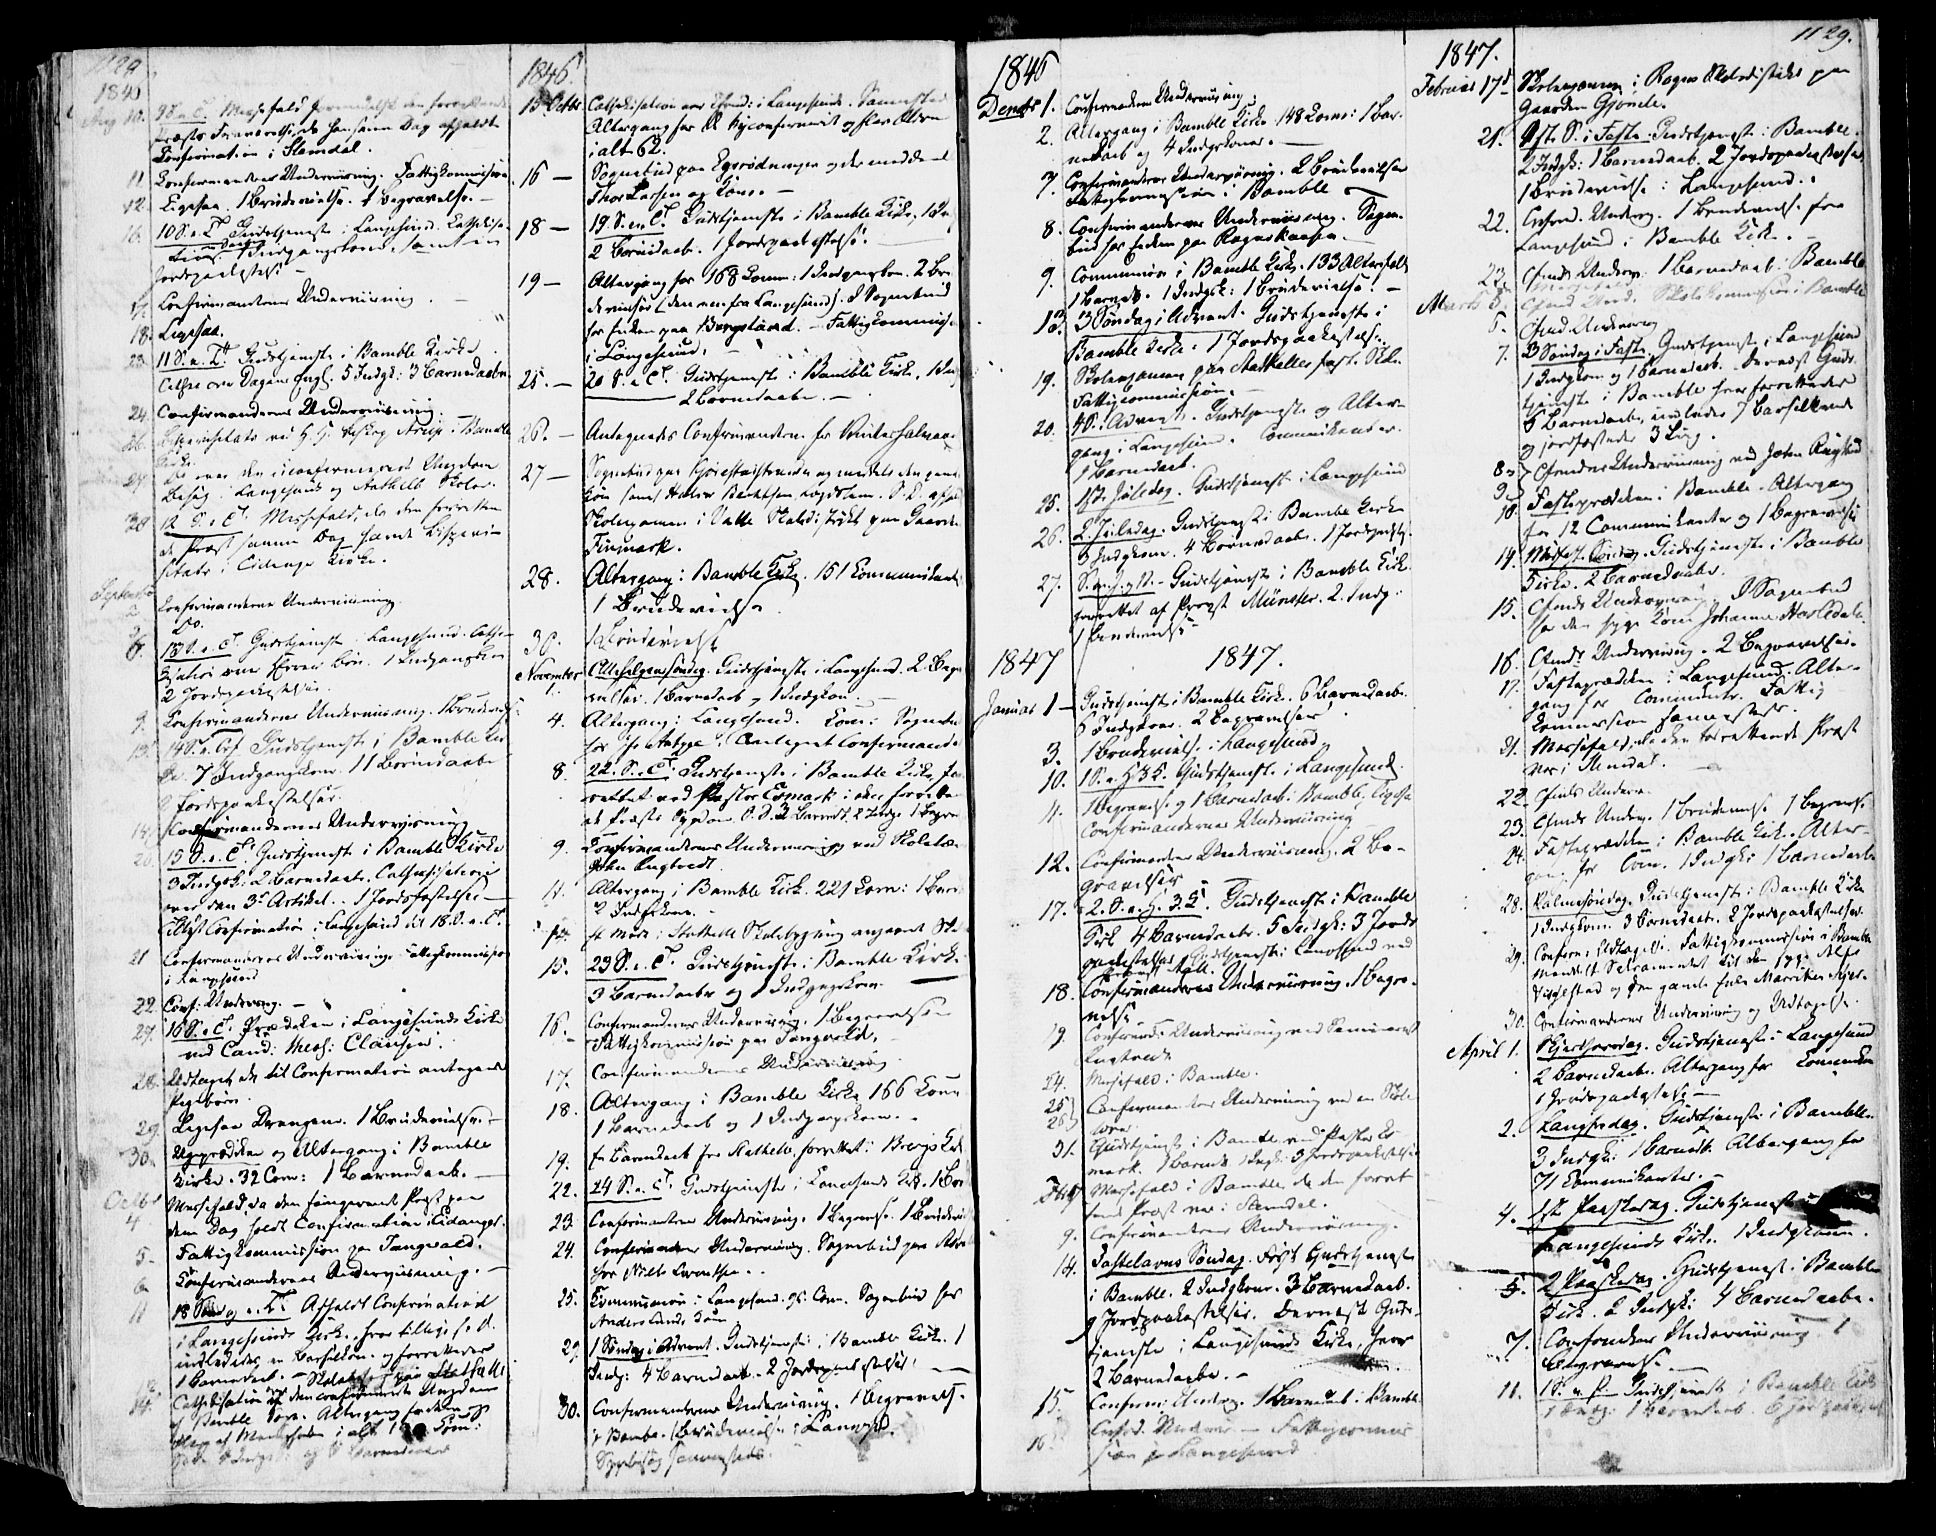 SAKO, Bamble kirkebøker, F/Fa/L0004: Ministerialbok nr. I 4, 1834-1853, s. 1128-1129